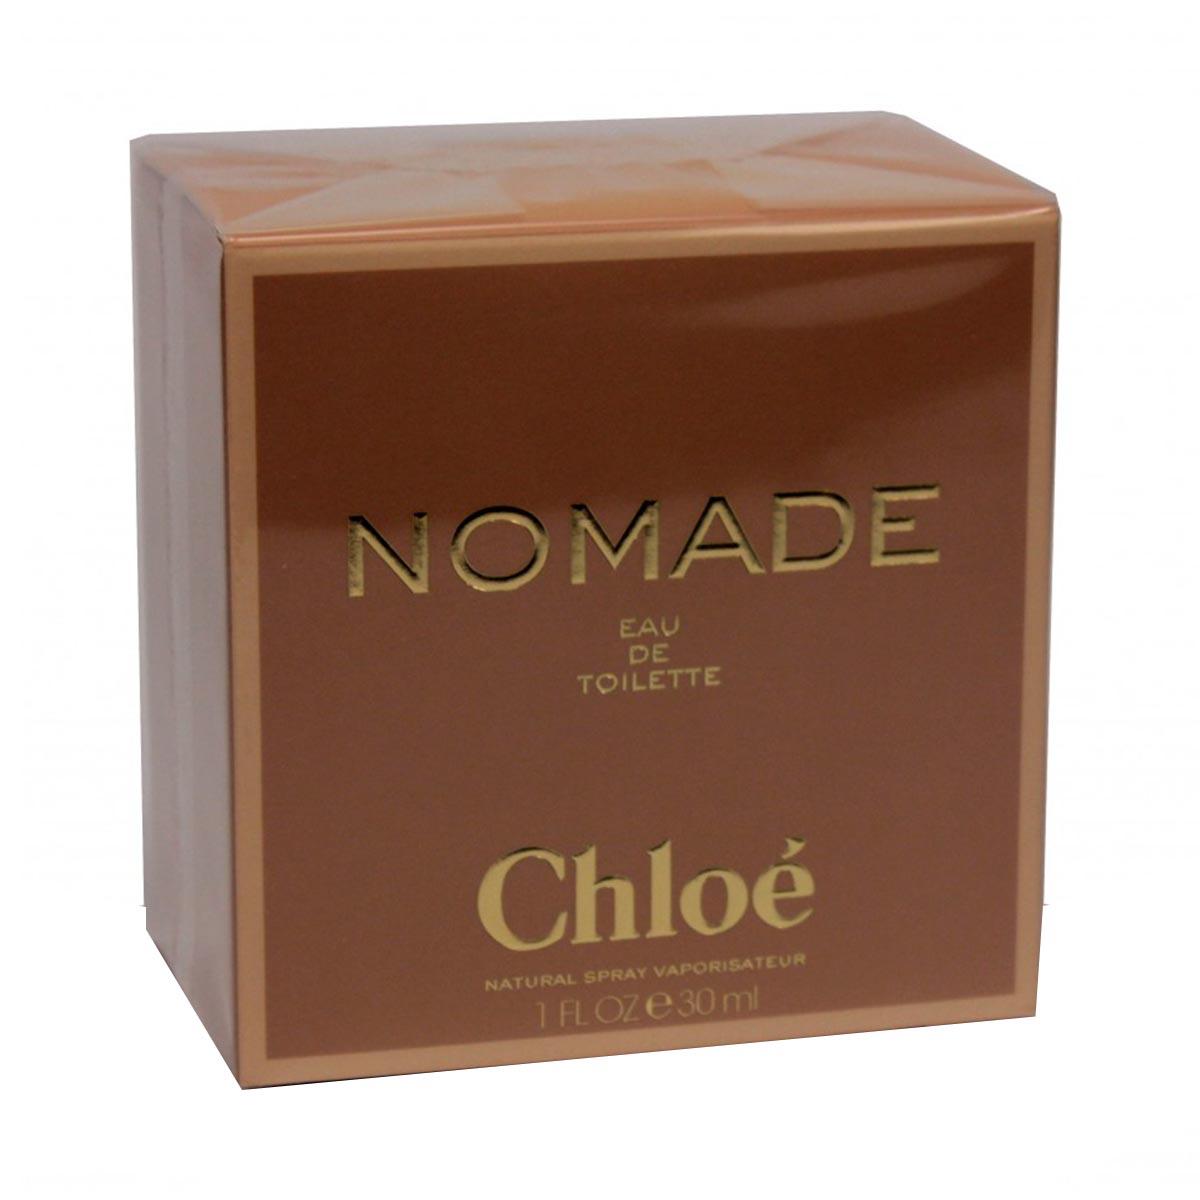 Chloe nomade eau de toilette 30ml vaporizador